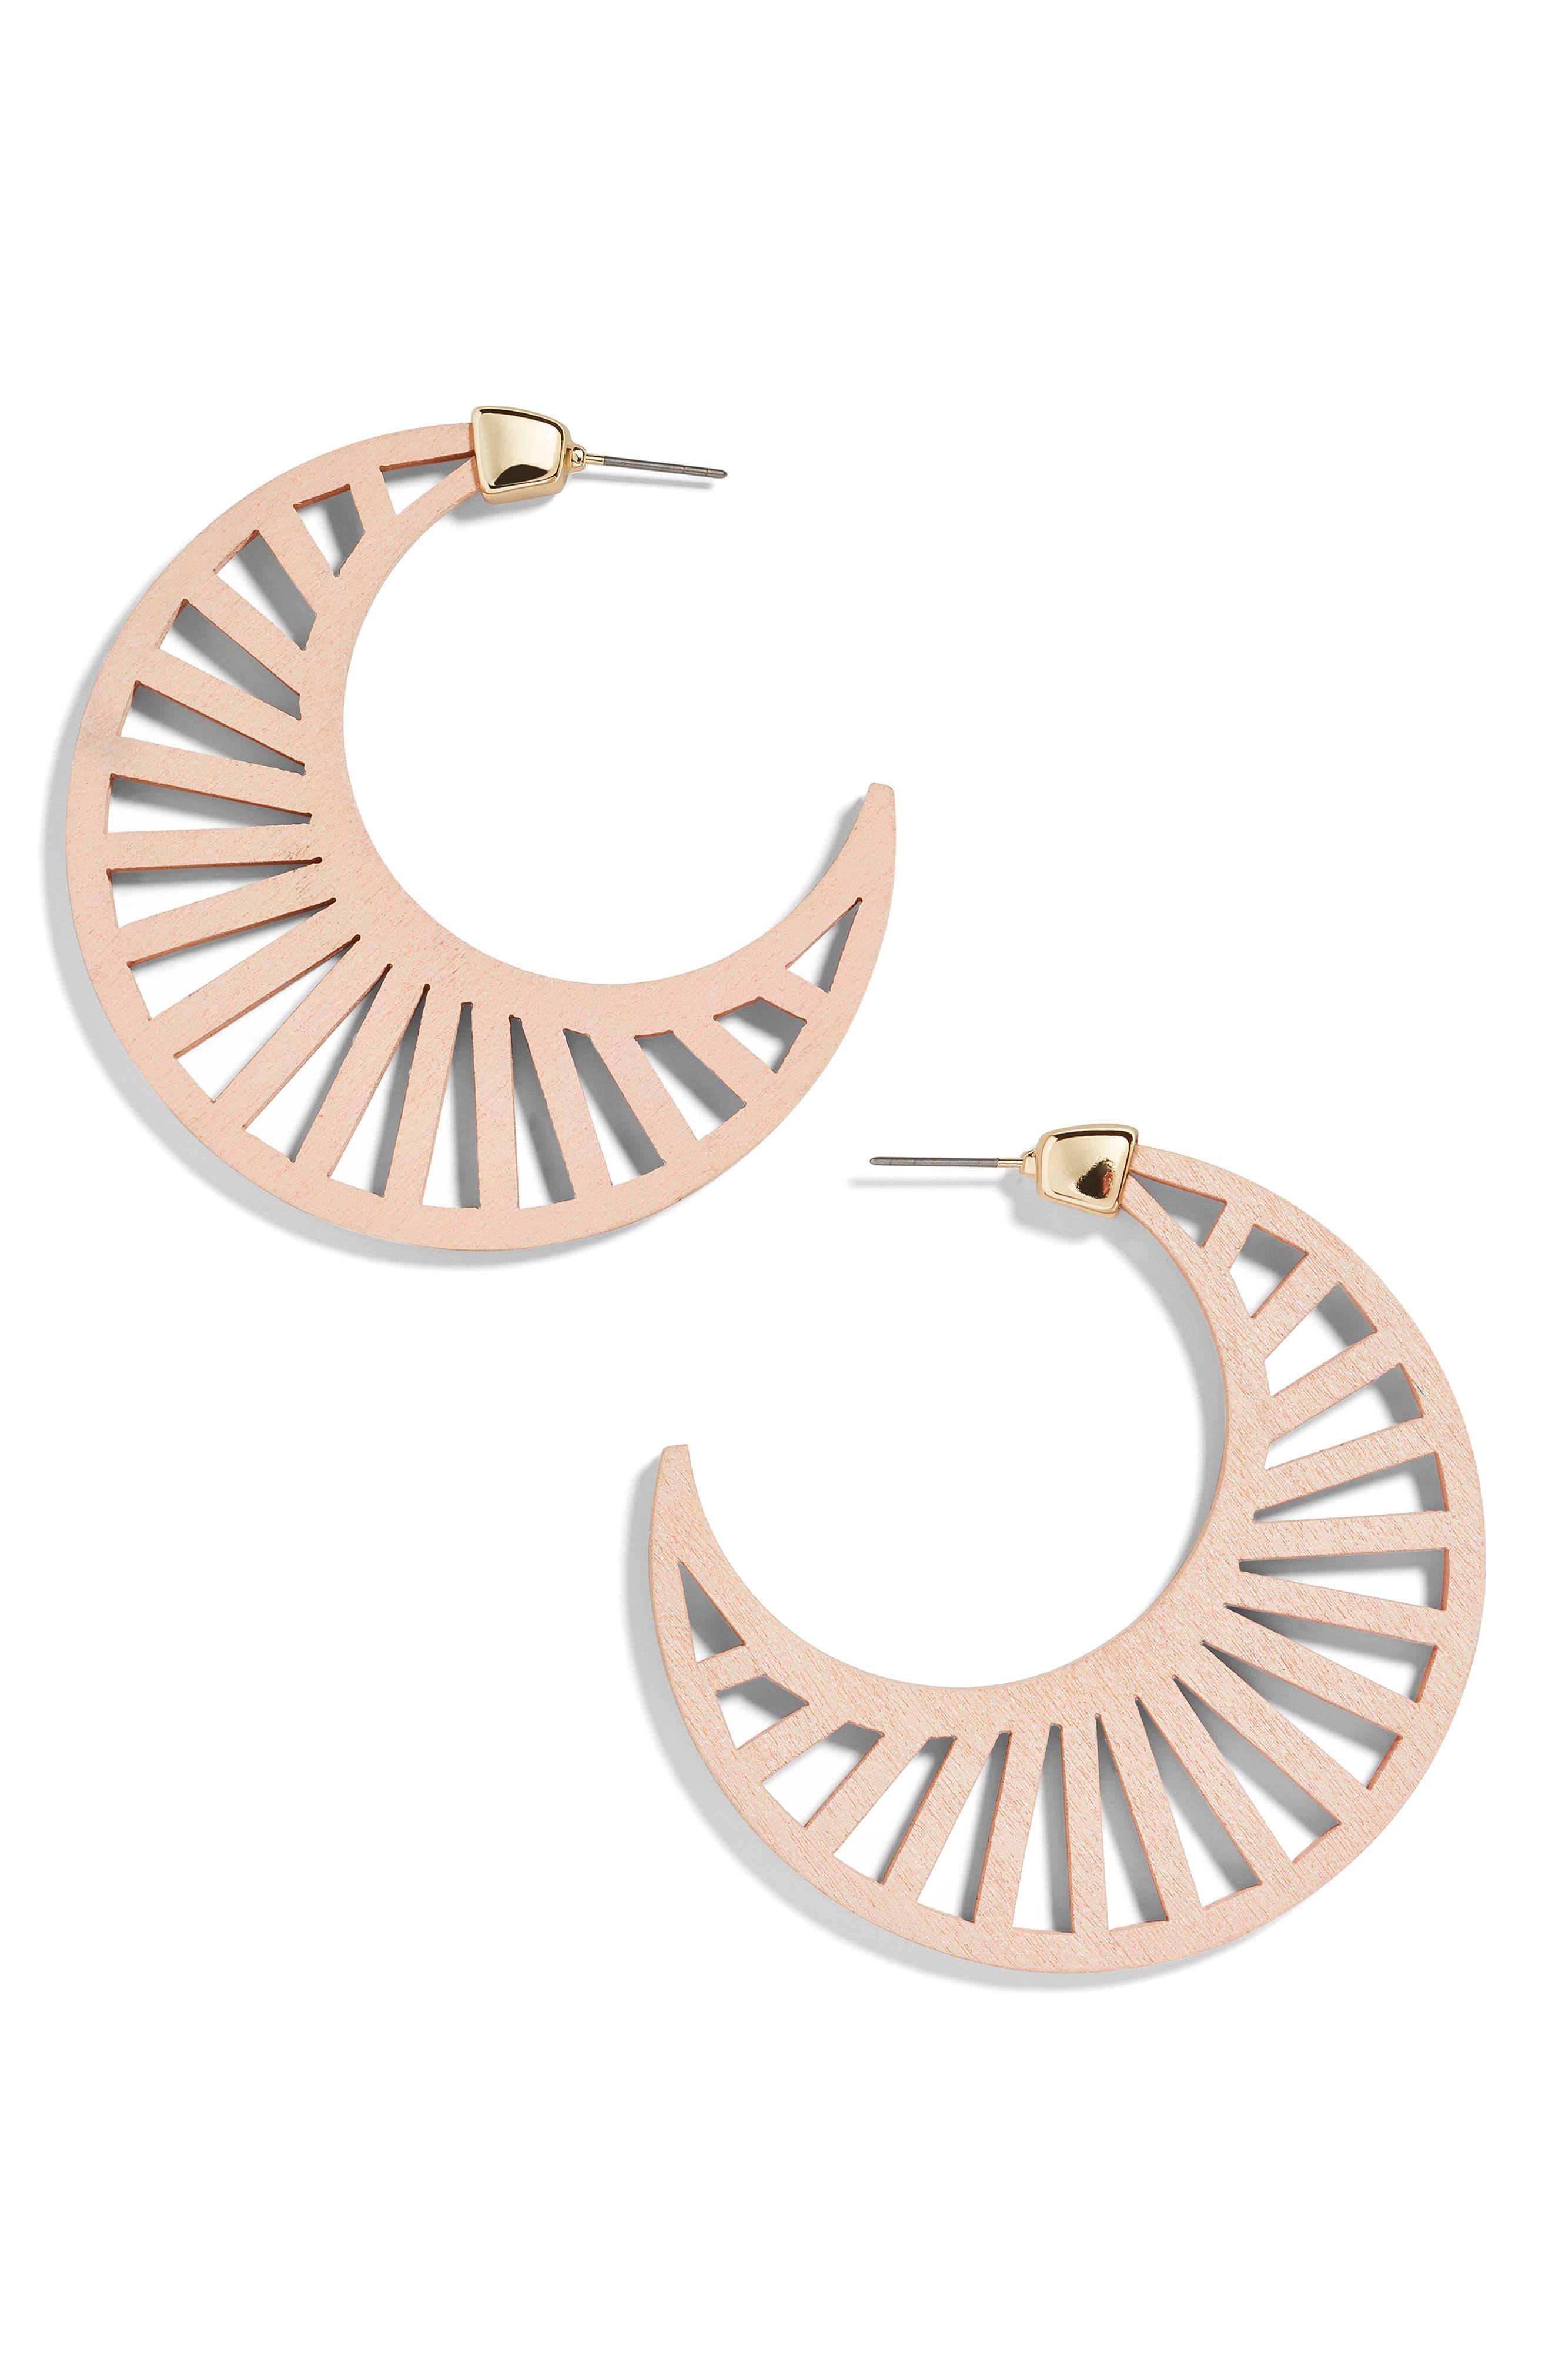 BAUBLEBAR, Wooden Crescent Moon Earrings, Main thumbnail 1, color, 250